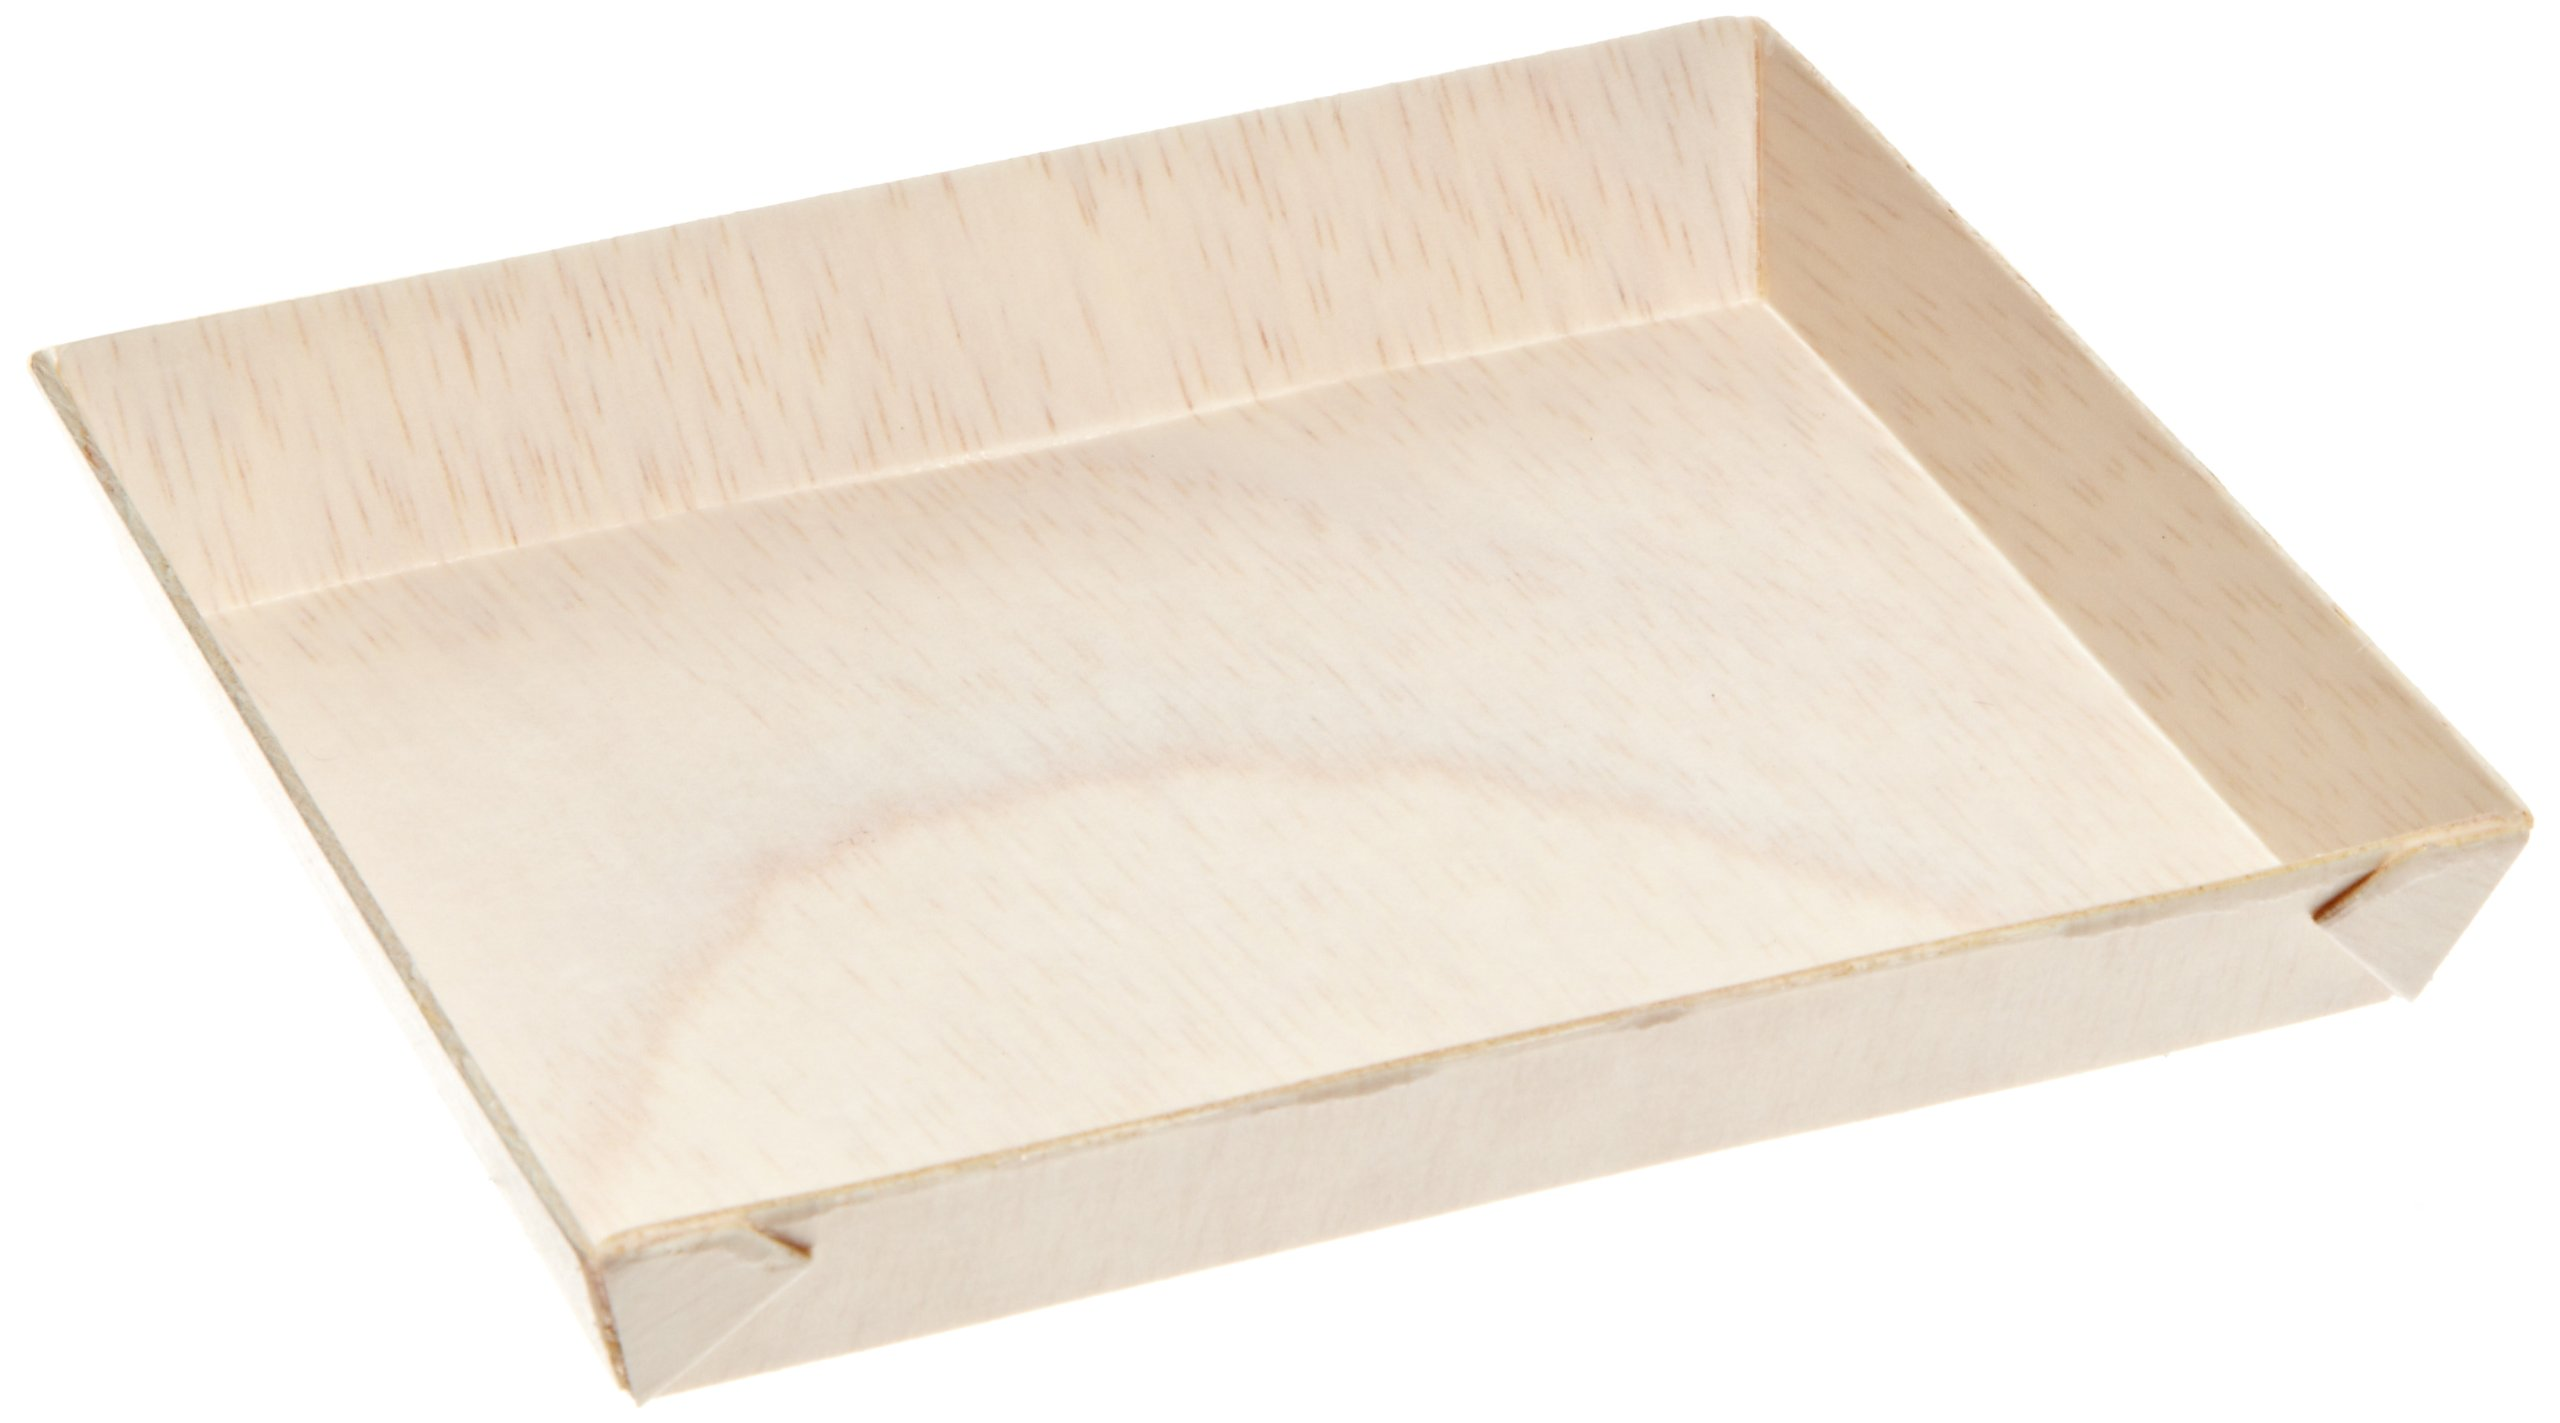 "PackNWood 210SAMBQ1313 ""Samurai'' Square Wooden Dish - 8 oz - 5.2 x 5.2 x .79'' - 100 per case by PacknWood (Image #1)"